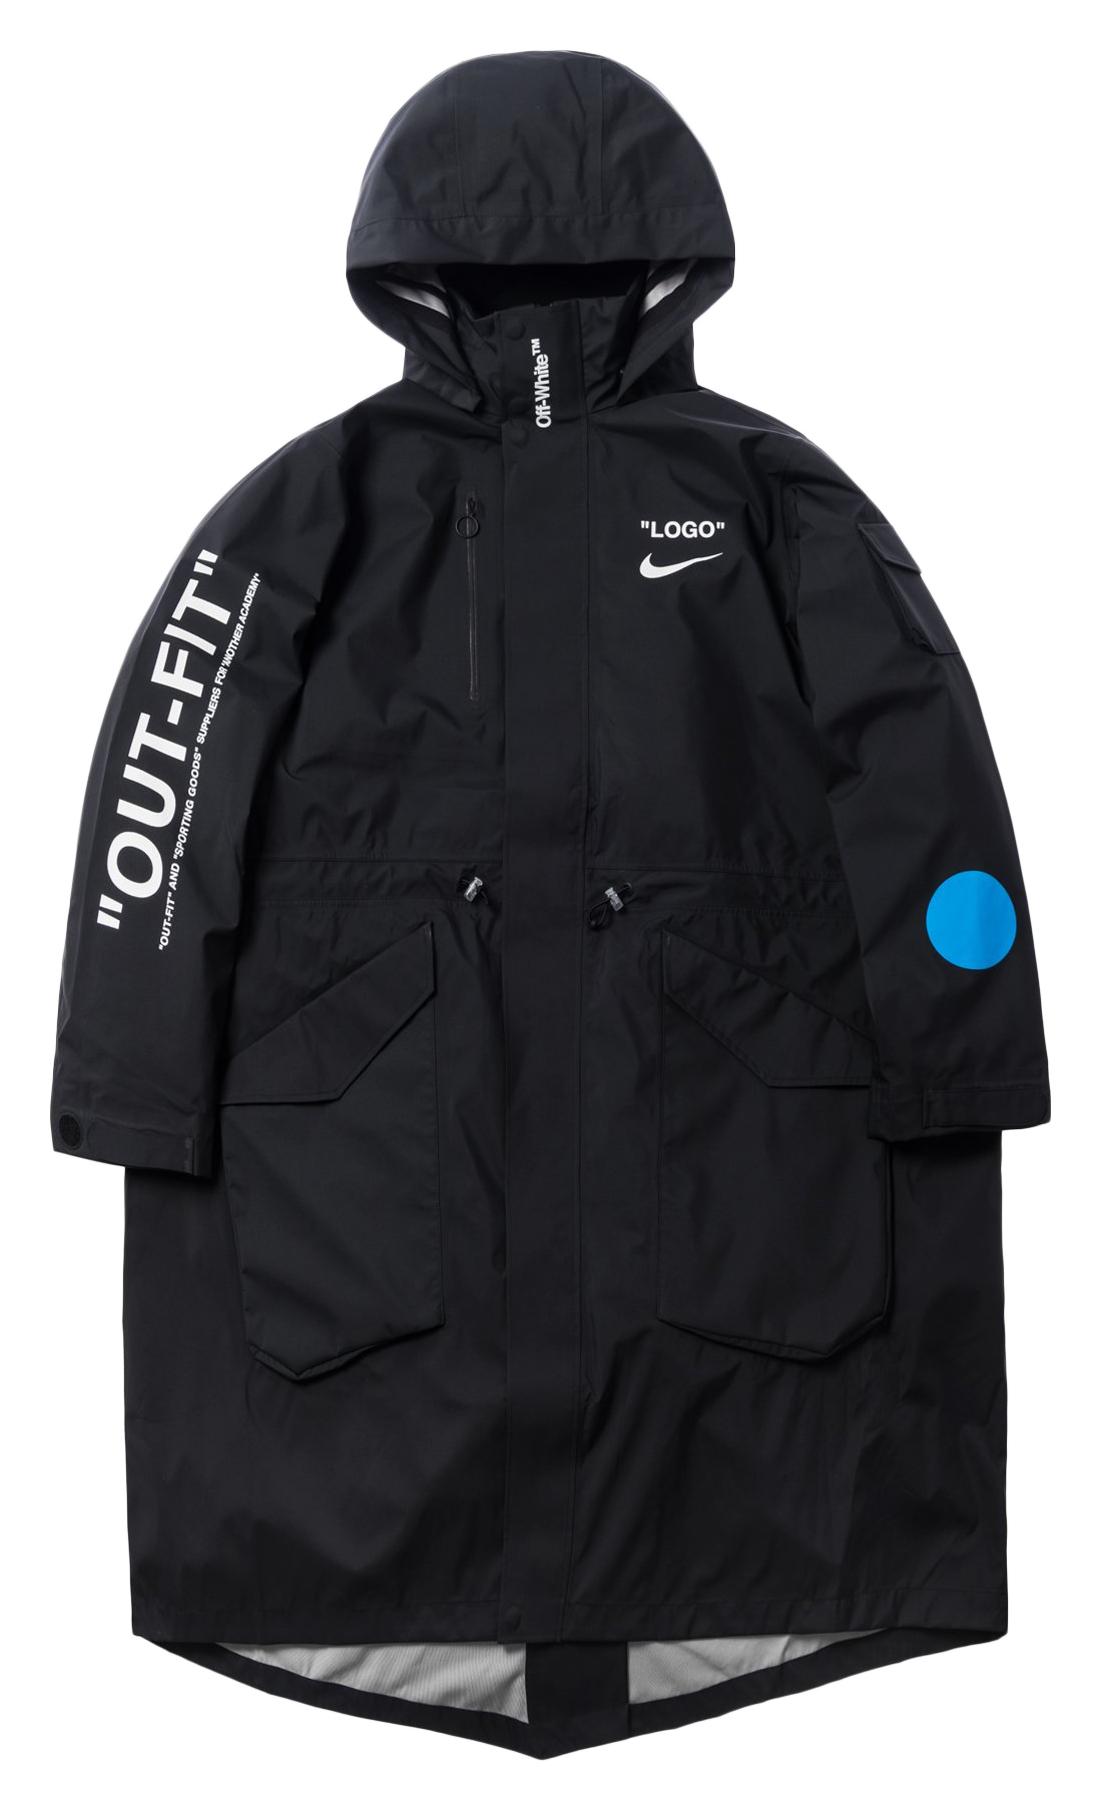 cbe468a68835b HypeAnalyzer · Nikelab x OFF-WHITE Mercurial NRG X Jacket Jacket Black